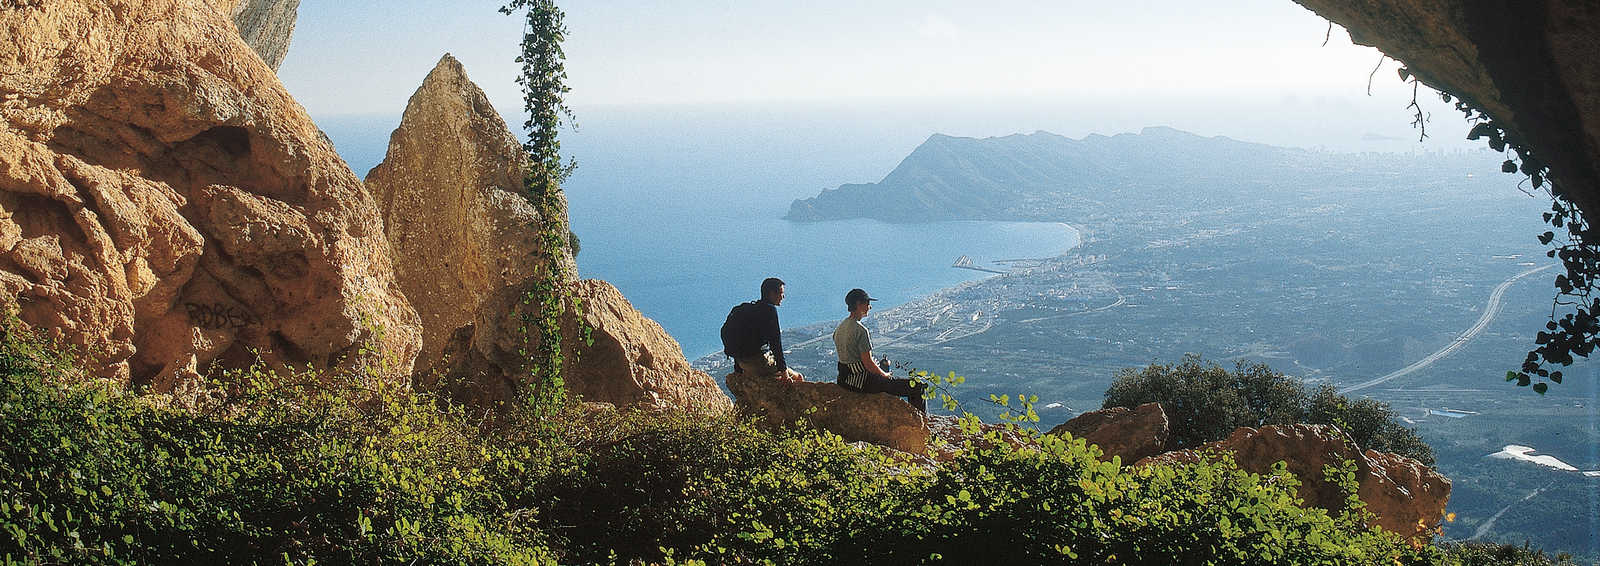 Walkers admire vista, Spain